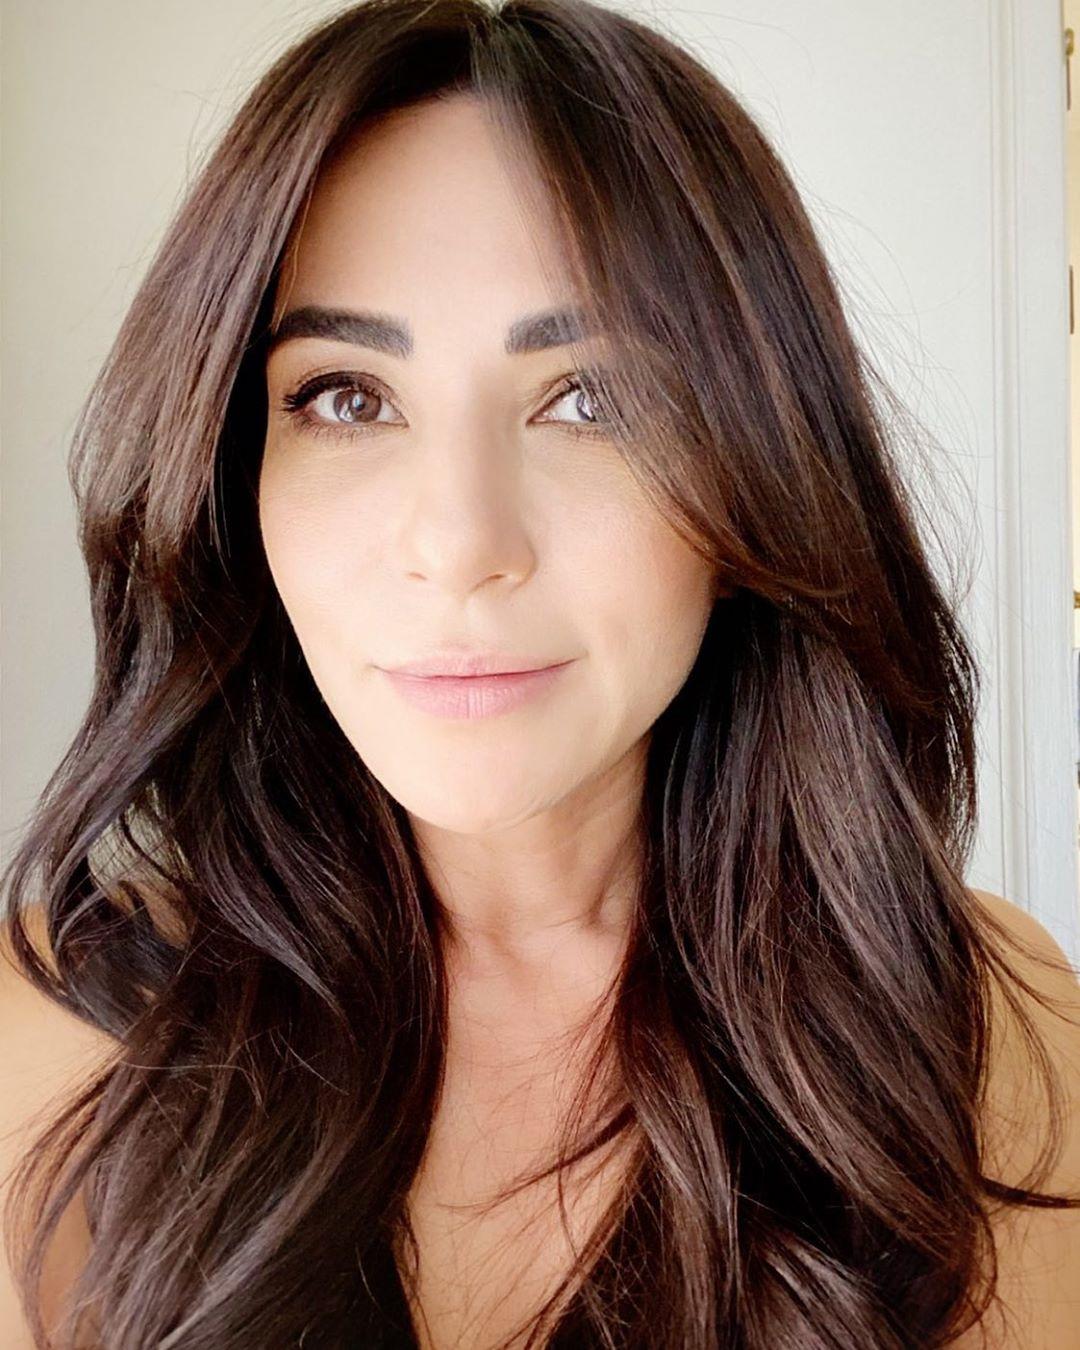 Marisol Nichols, Instagram photo